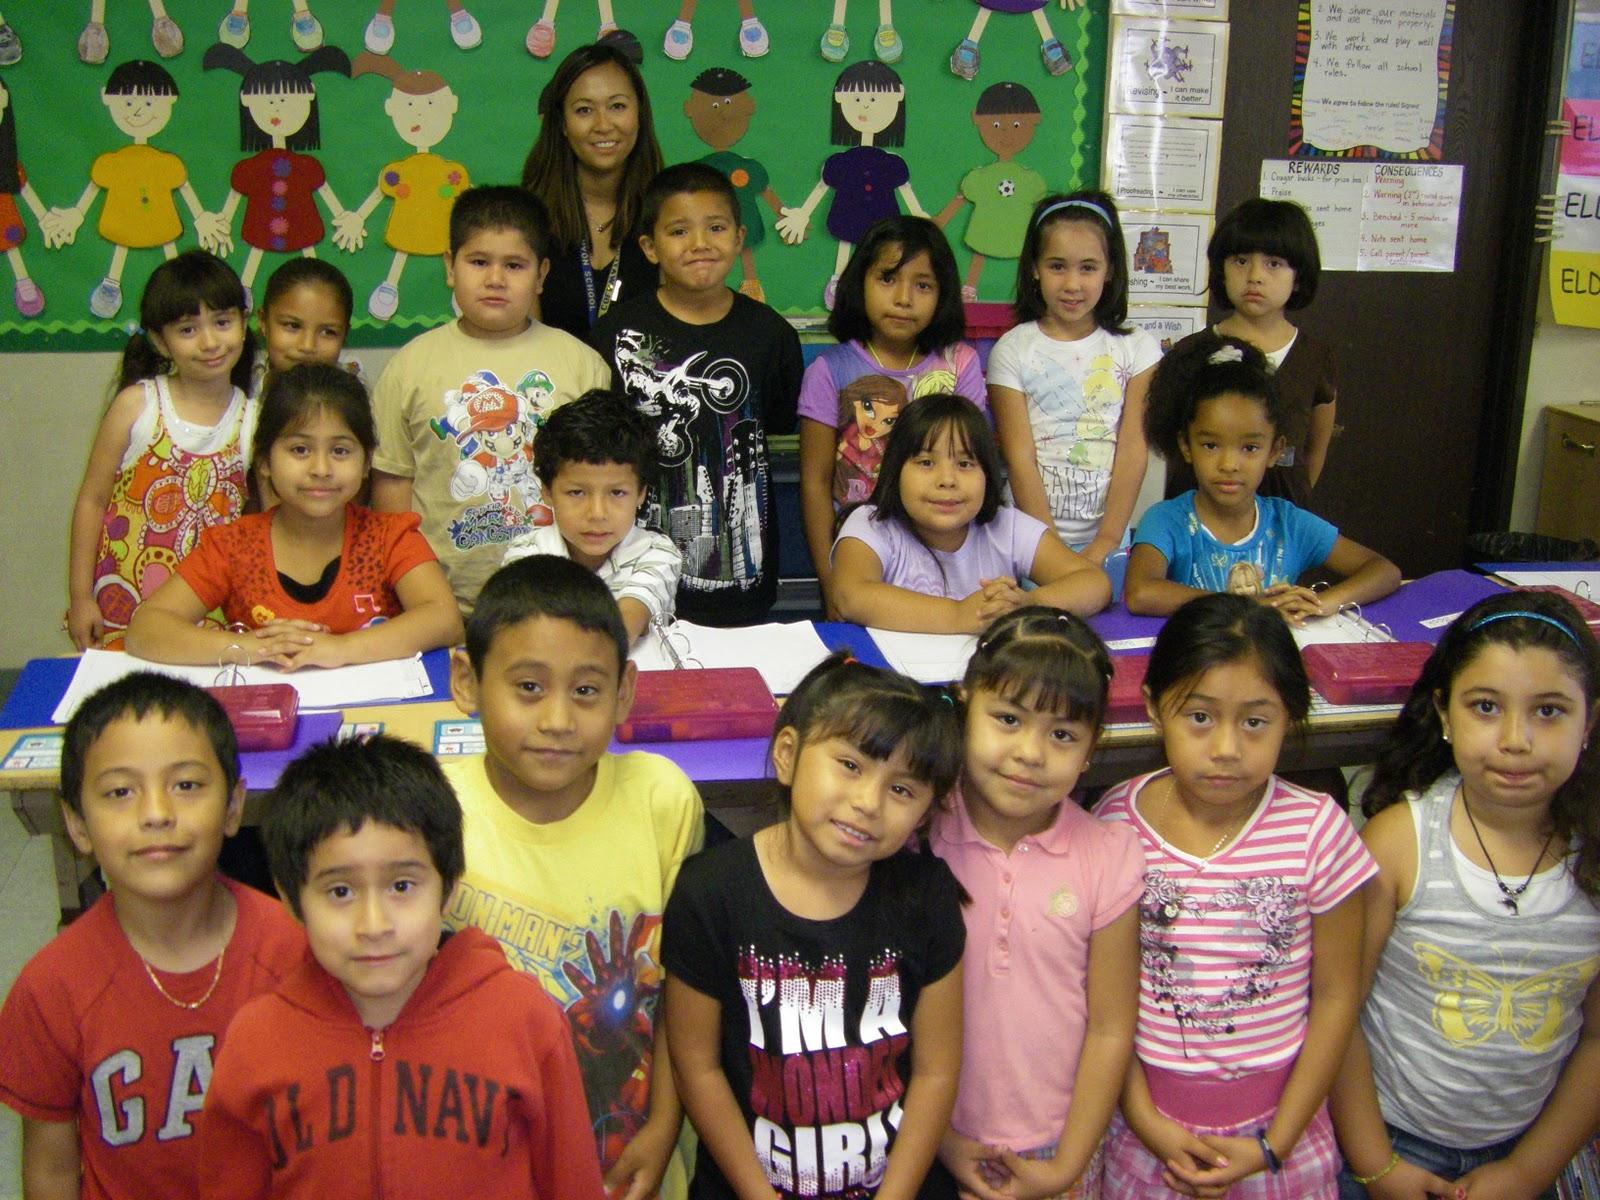 Kinder Garden: Coldwater Canyon Elementary School: Kindergarten/1st Grade